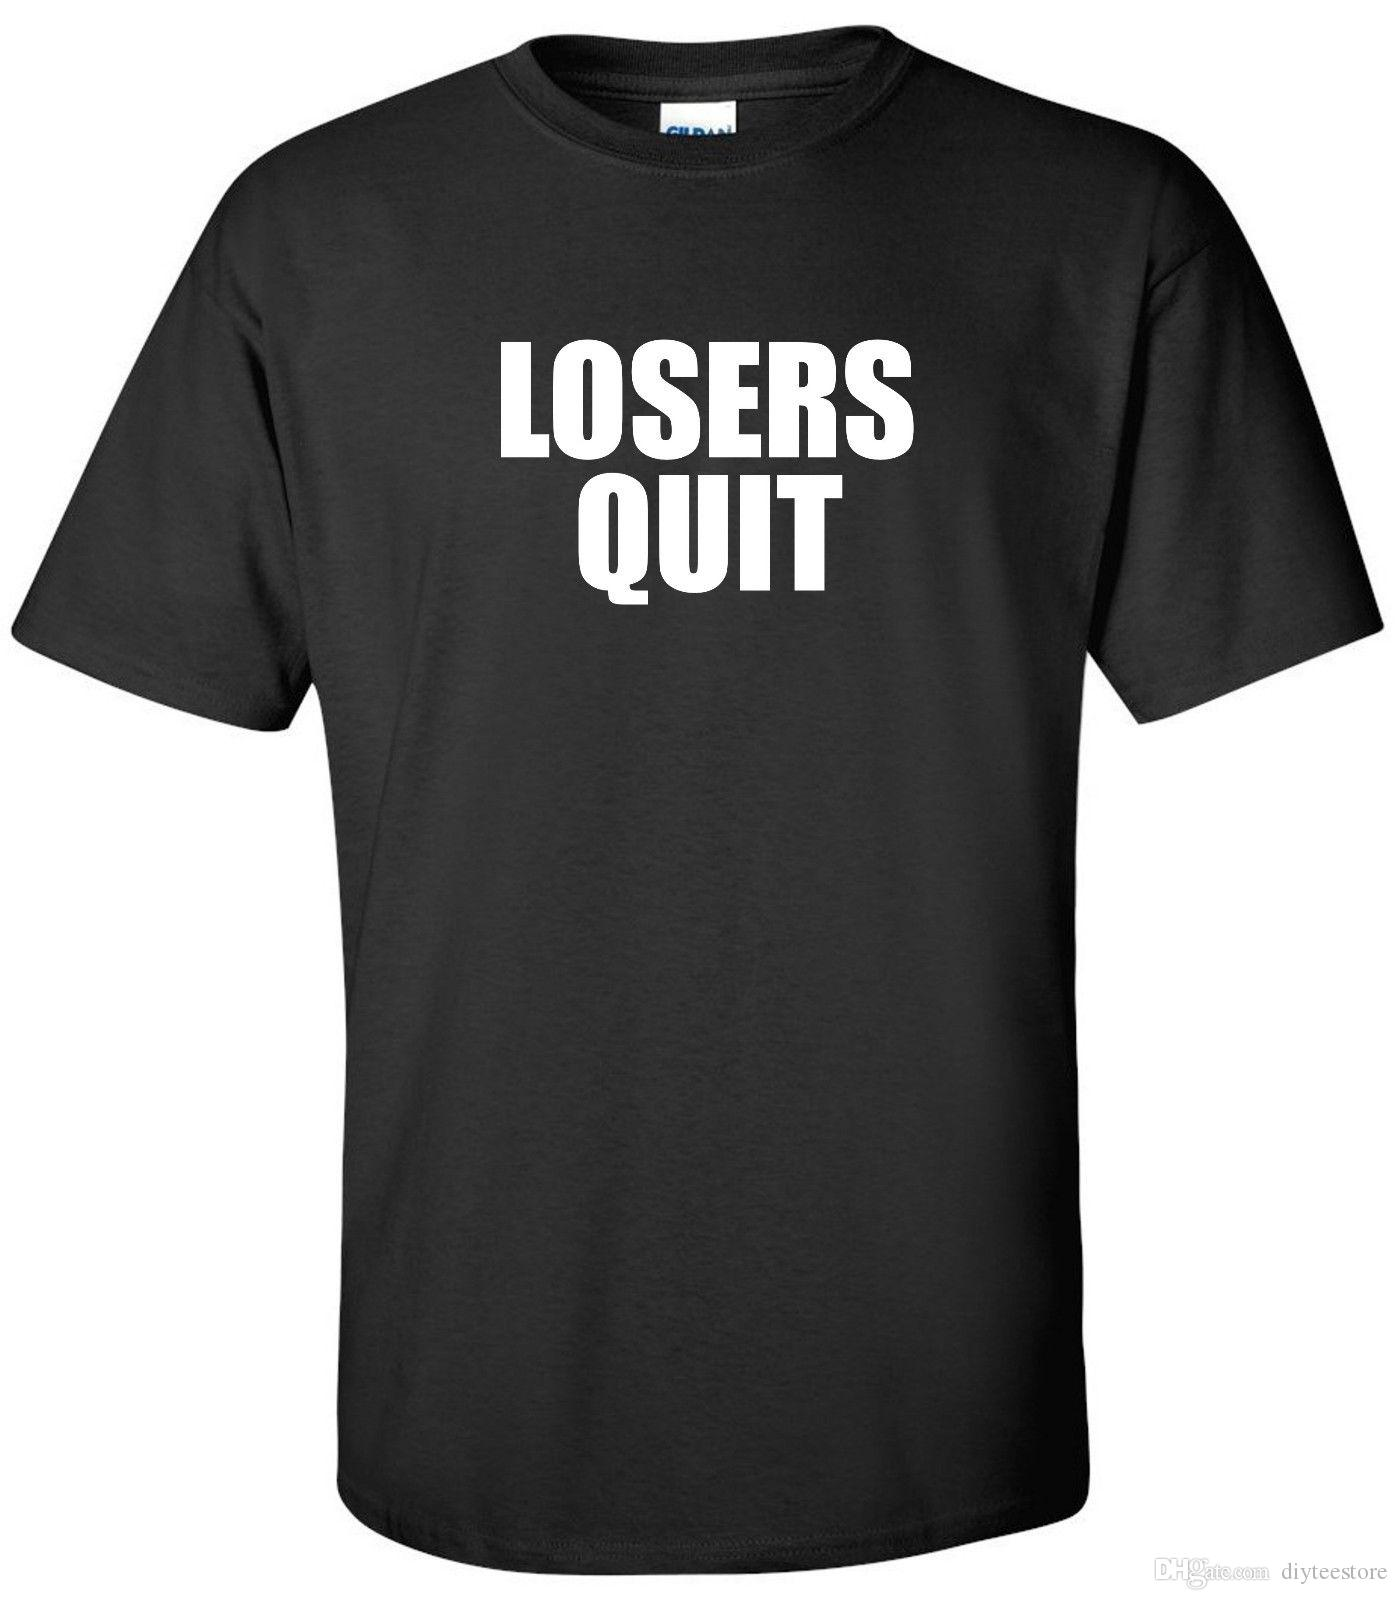 62edc8318db Losers Quit T Shirt Football Basketball Baseball Support Dropship  Motivational Shirt T Shirt Men Rock Custom Short Sleeve Boyfriend S Plus S Tee  Shirts For ...